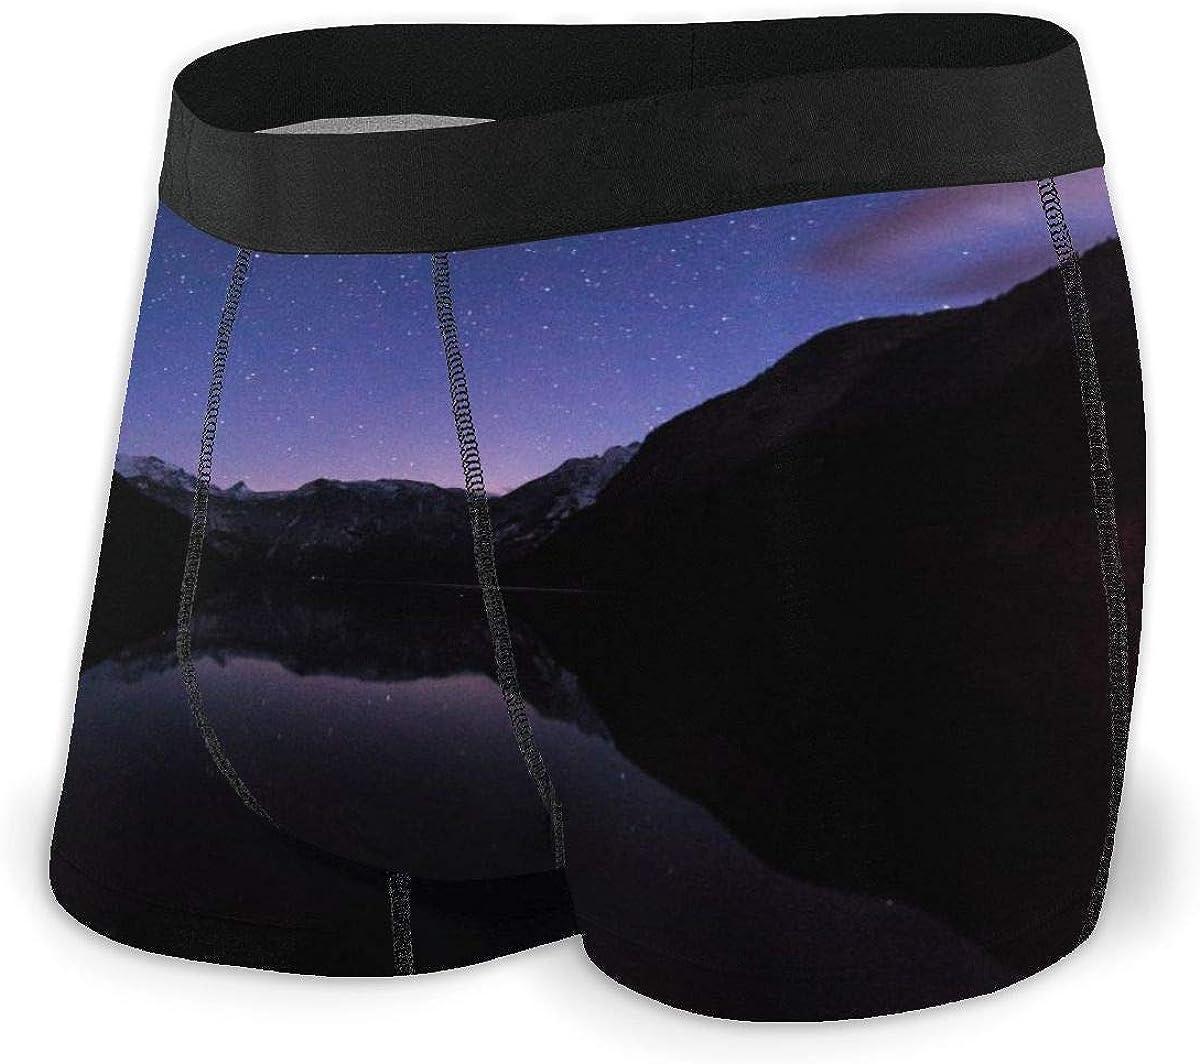 Mens Boxer Briefs Marvellous Alps Mountain Night Scenery Bikini Underwear Stretch Low Rise Trunks Boys Underpants